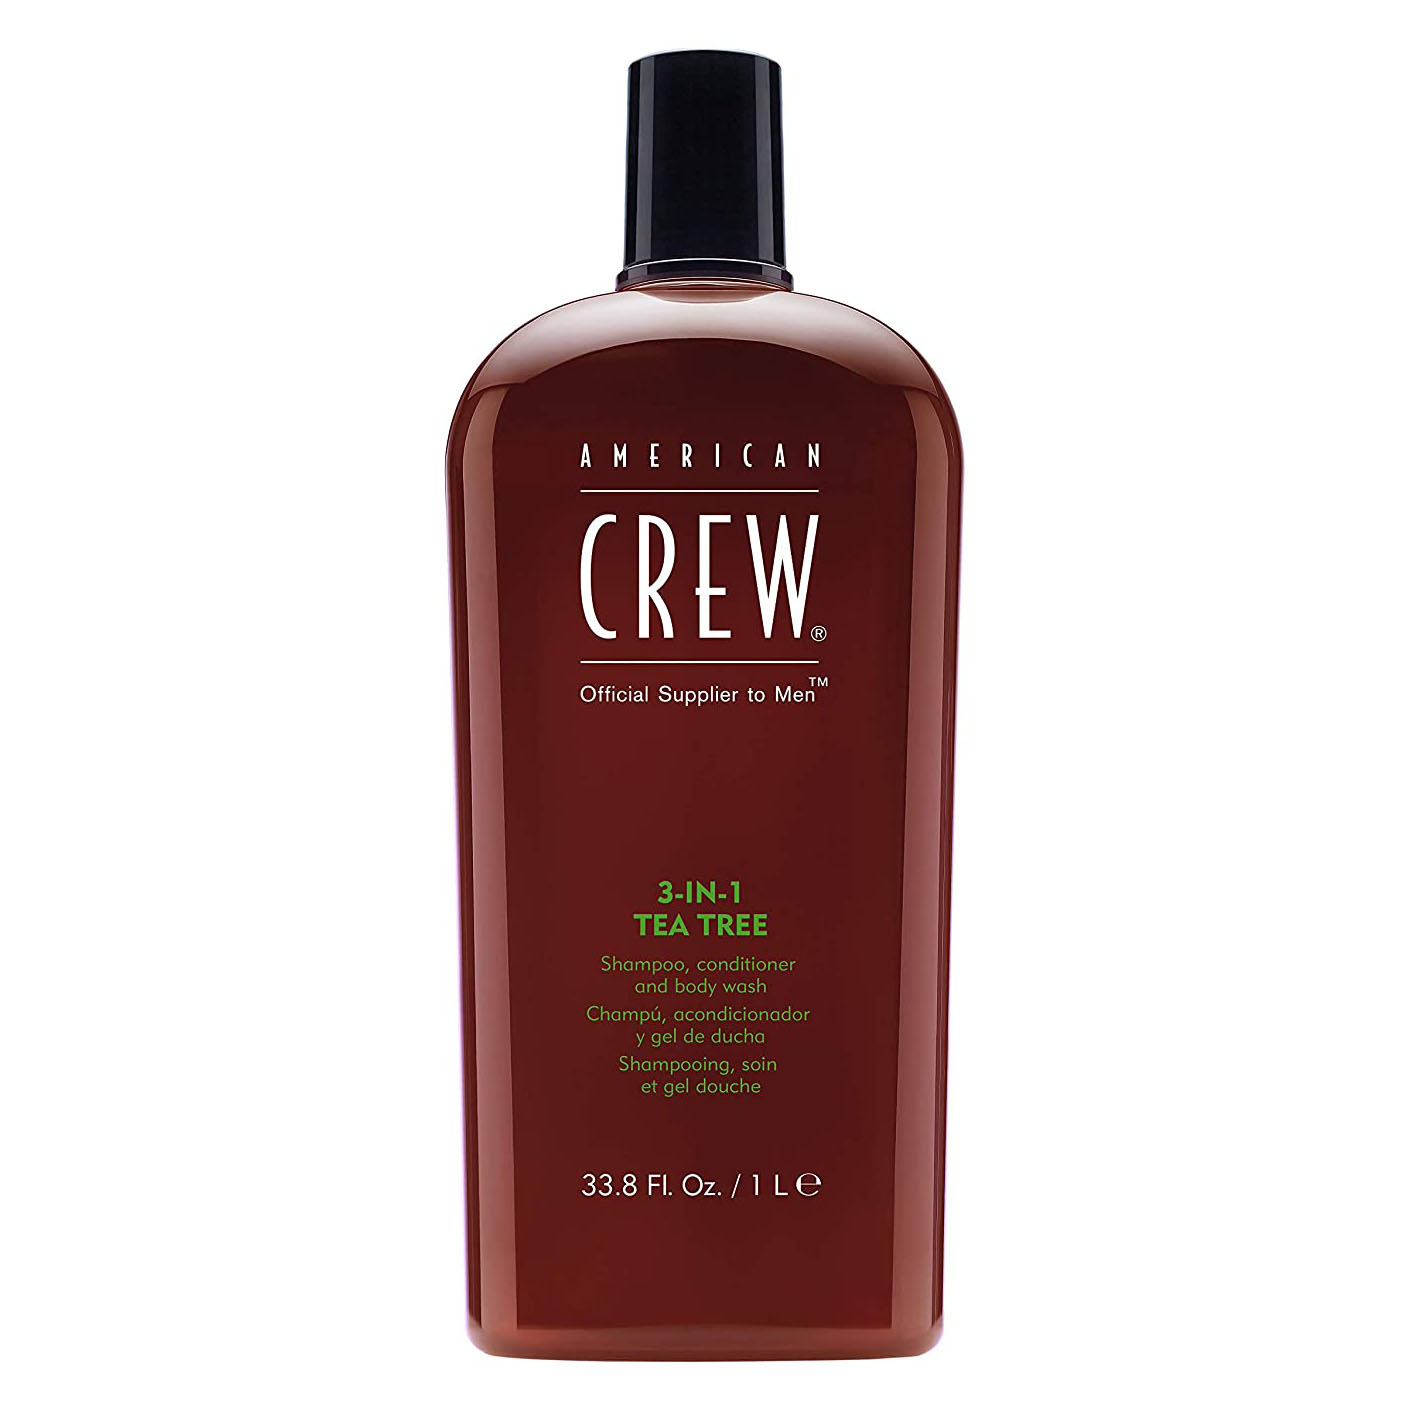 American Crew Three-in-One Shampoo Conditioner & Bodywash